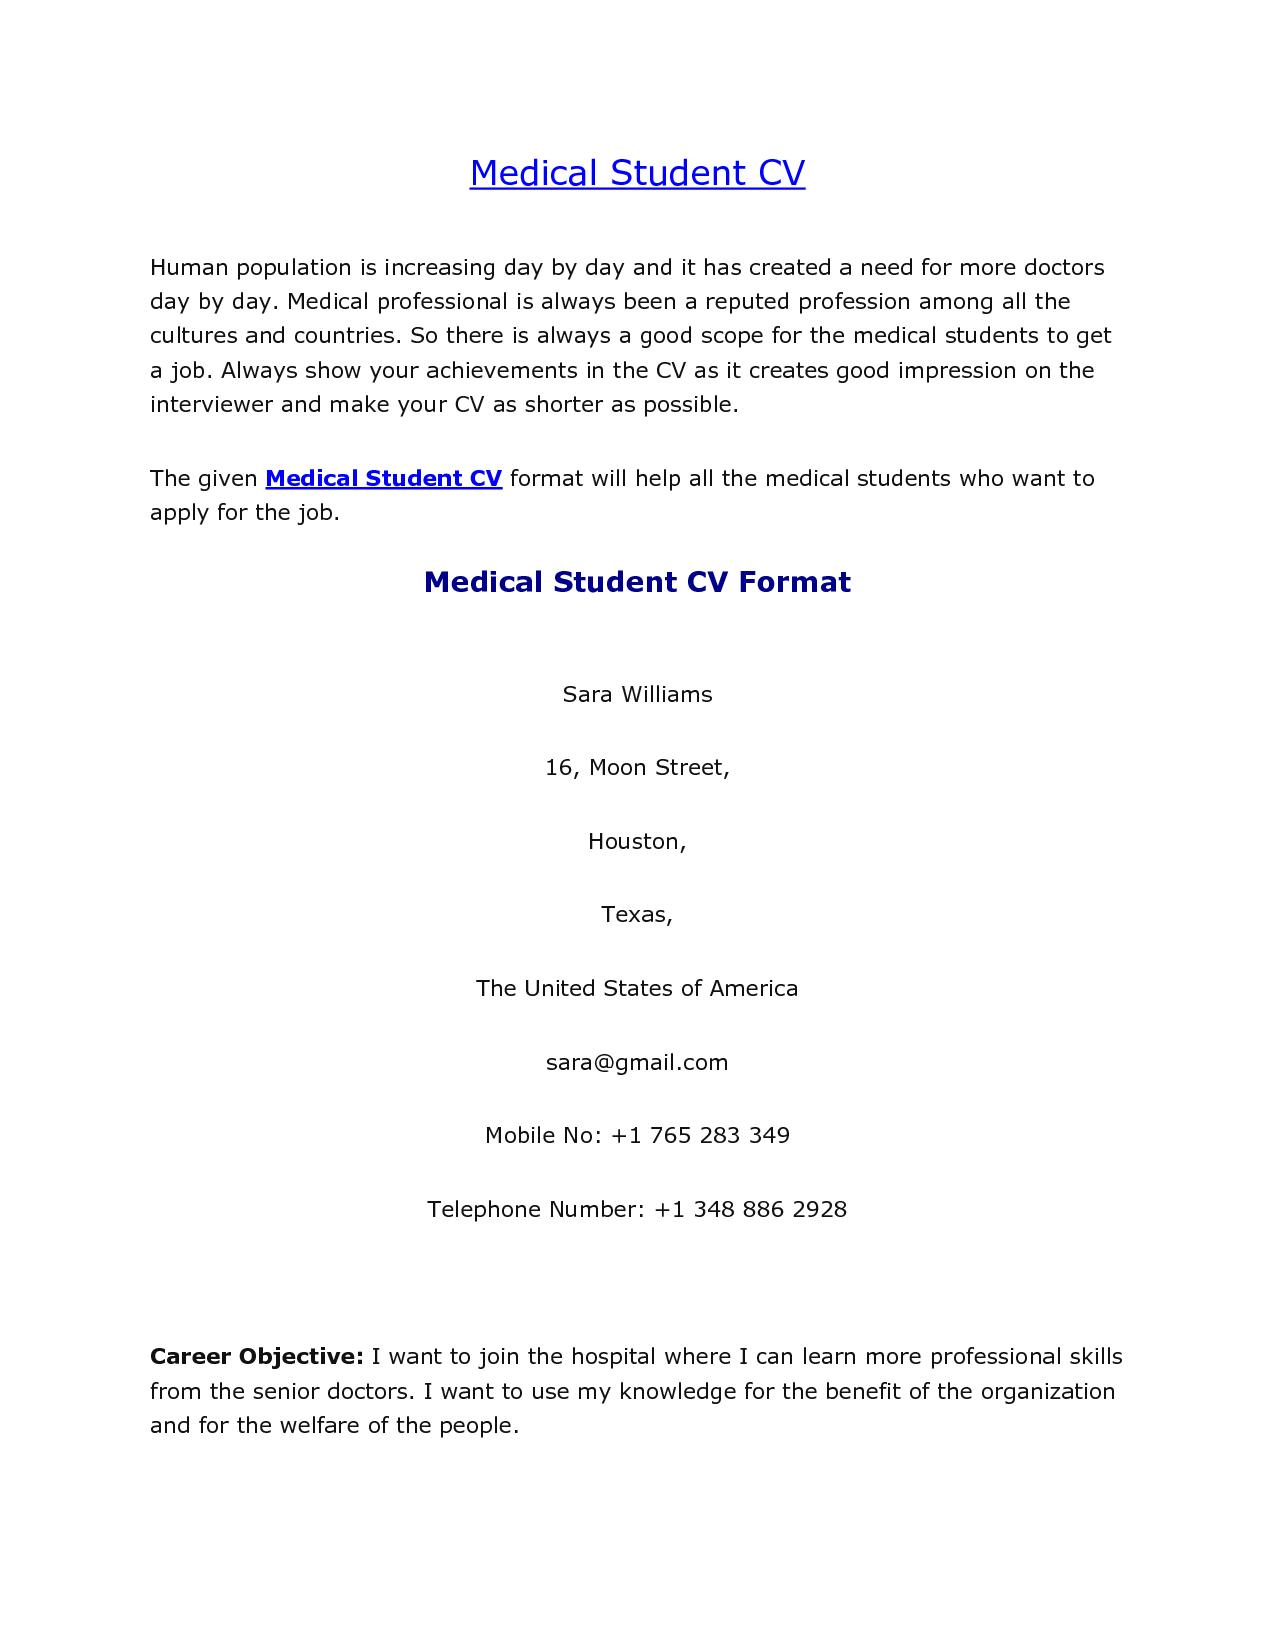 Medical Student Cv Sample